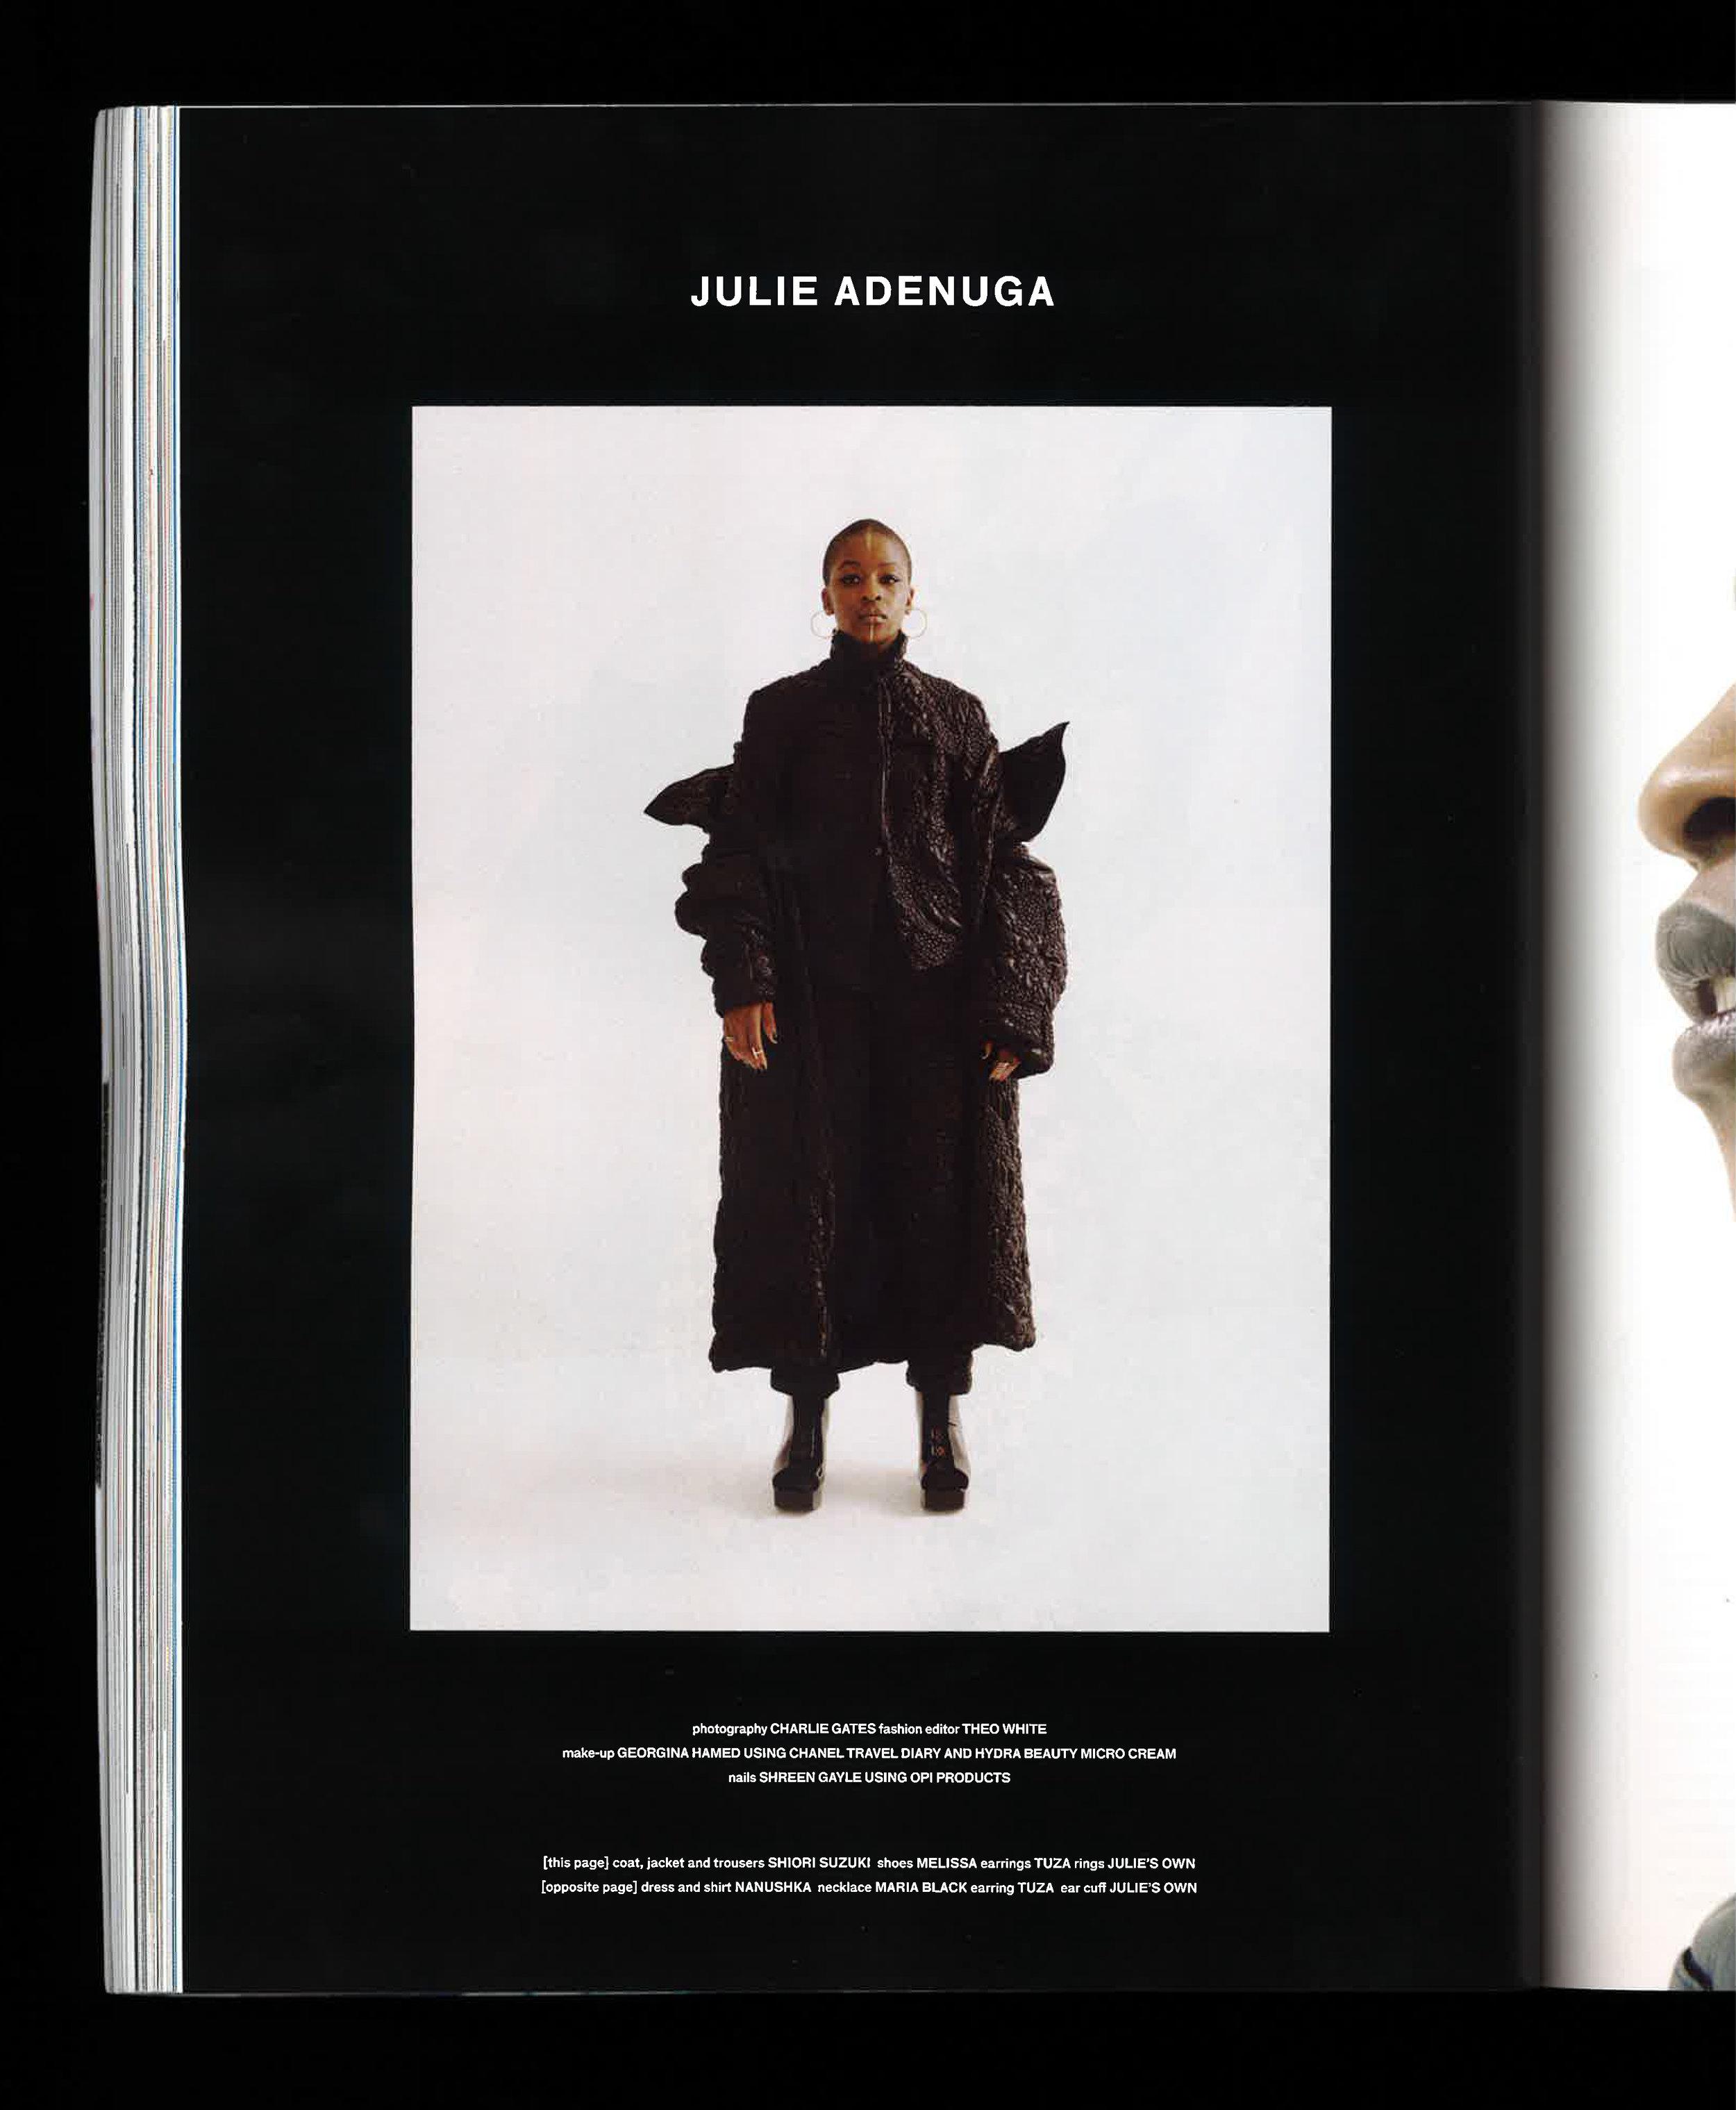 FeatureD  Julie Adenuga interview, 'MAD WORLD' (Autumn/Winter 2017) H  UNGER MAGAZINE    Credits:   worn by   JULIE ADENUGA   photography   CHARLIE GATES   fashion editor   THEO WHITE   makeup   GEORGINA HAMED   nails   SHREEN GAYLE